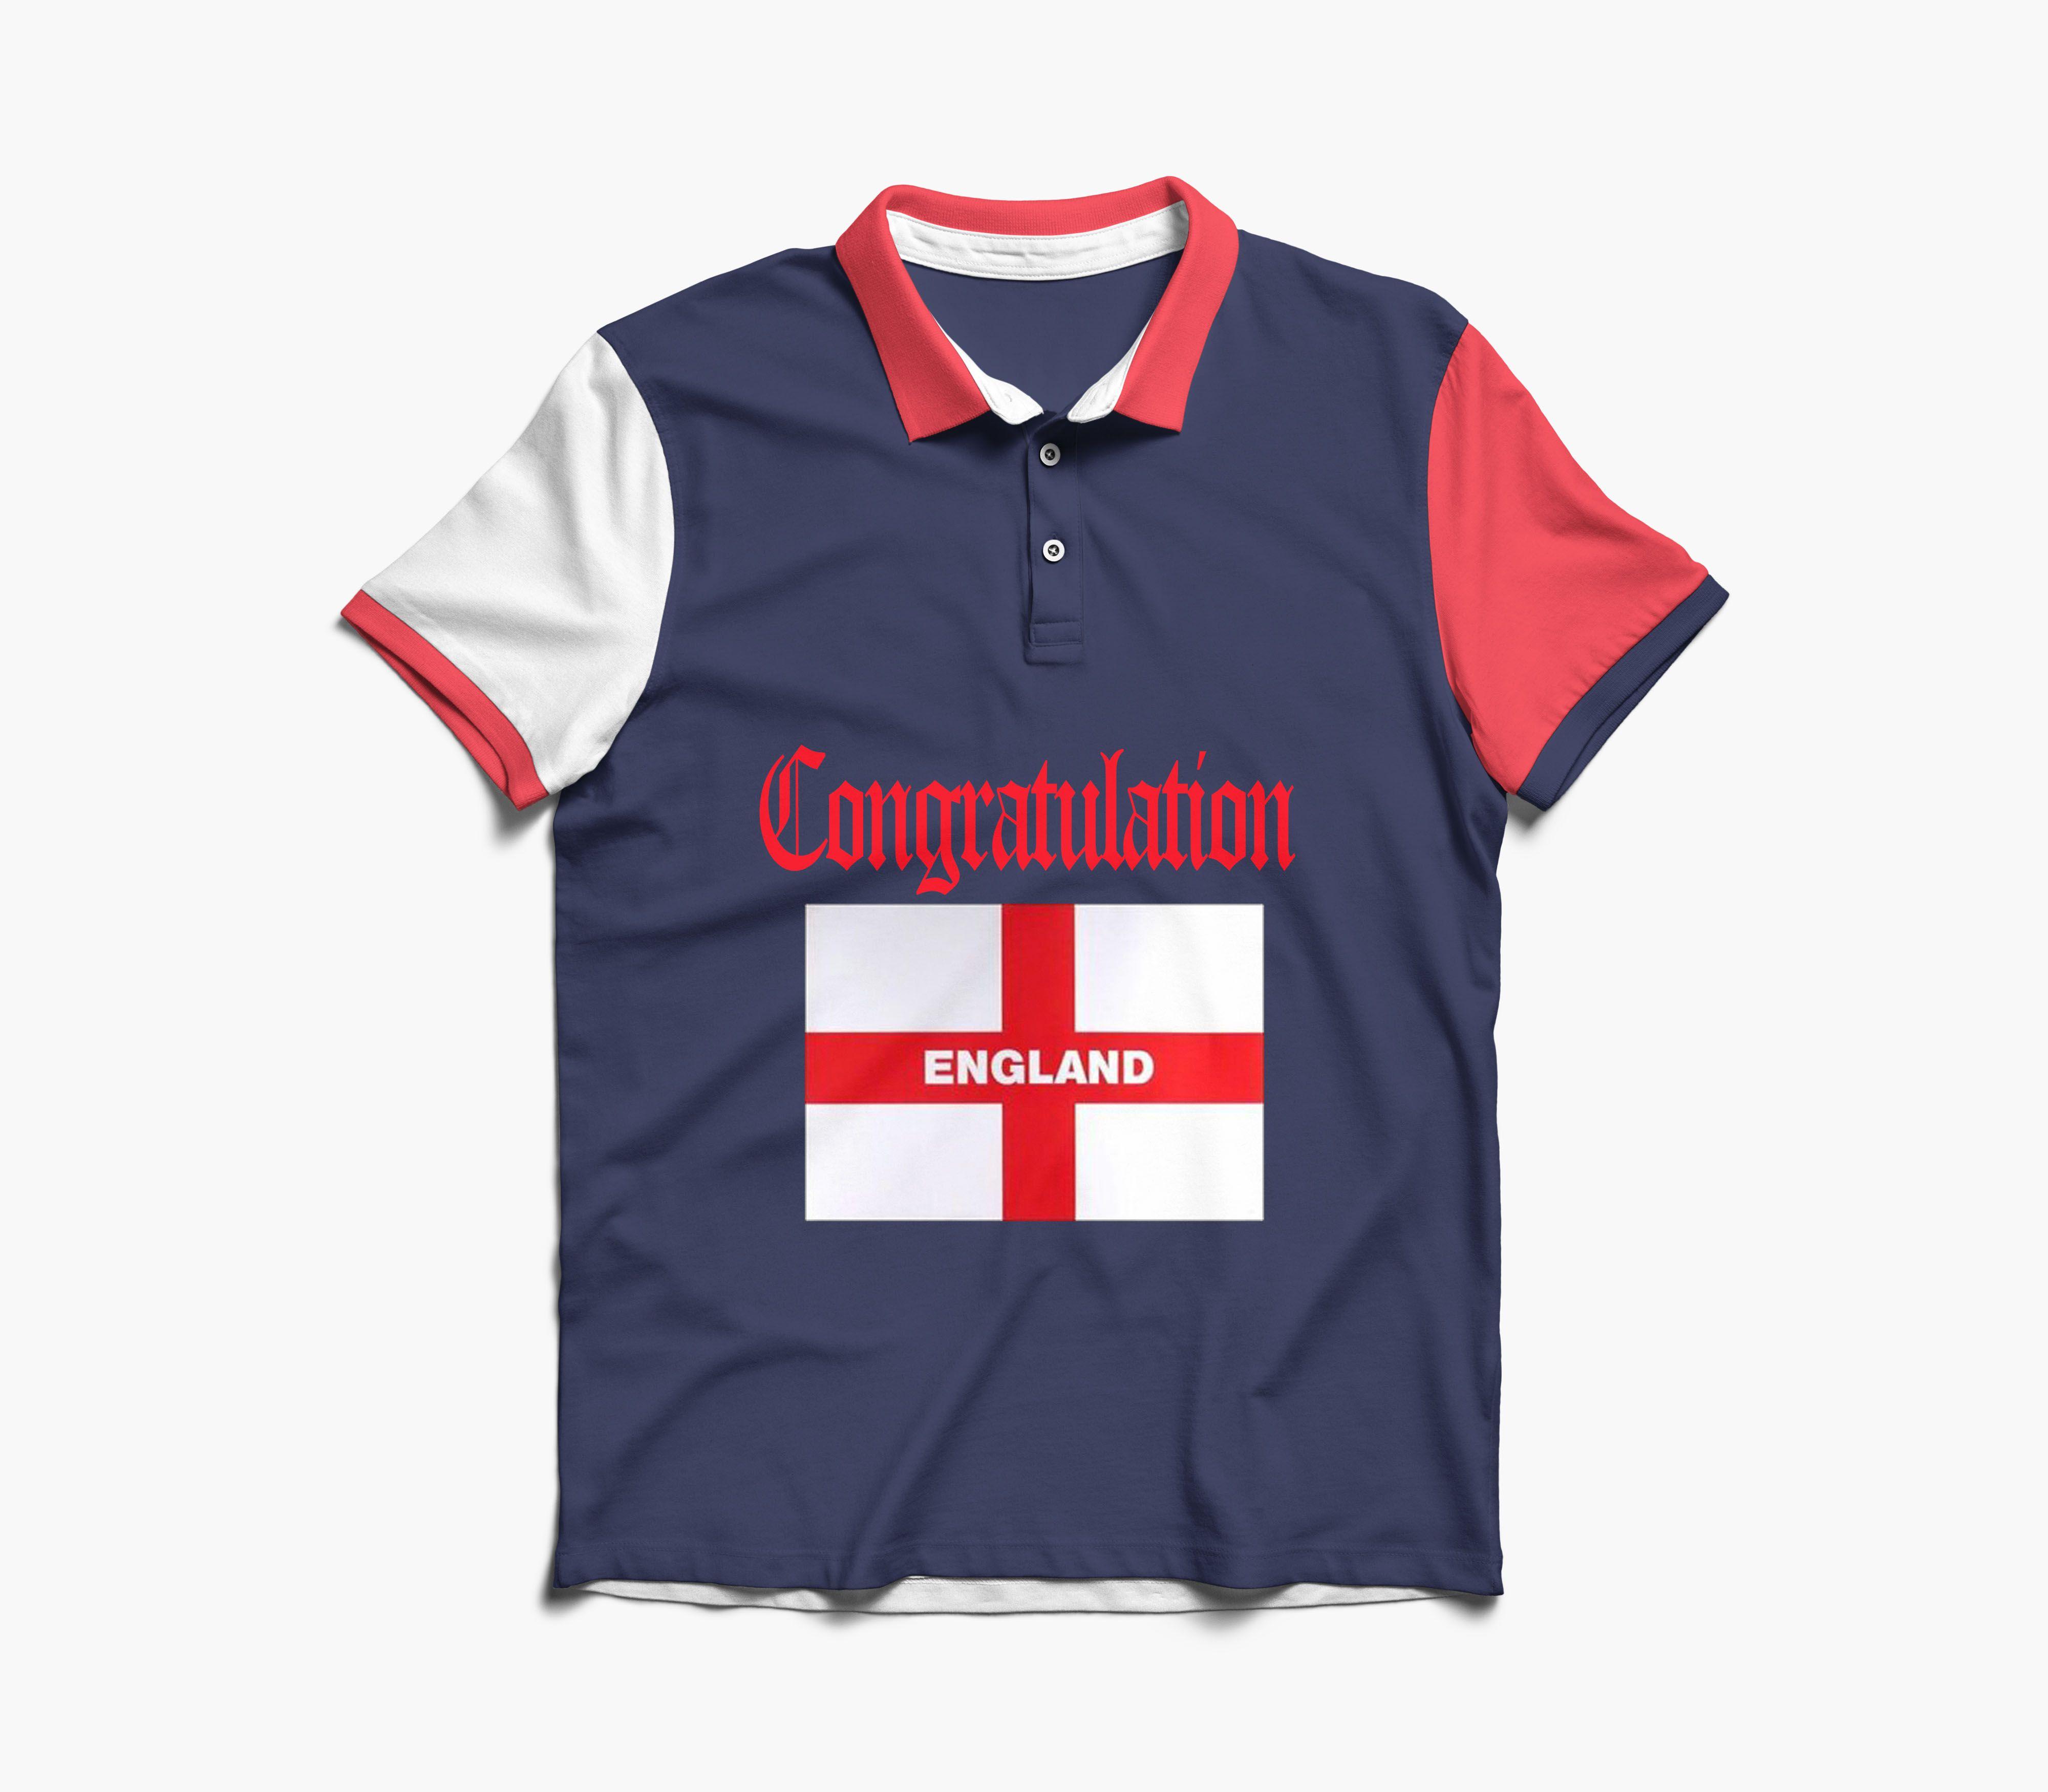 England Wind Cricket World Cup T Shirt Shirt Designs Tshirt Designs T Shirt